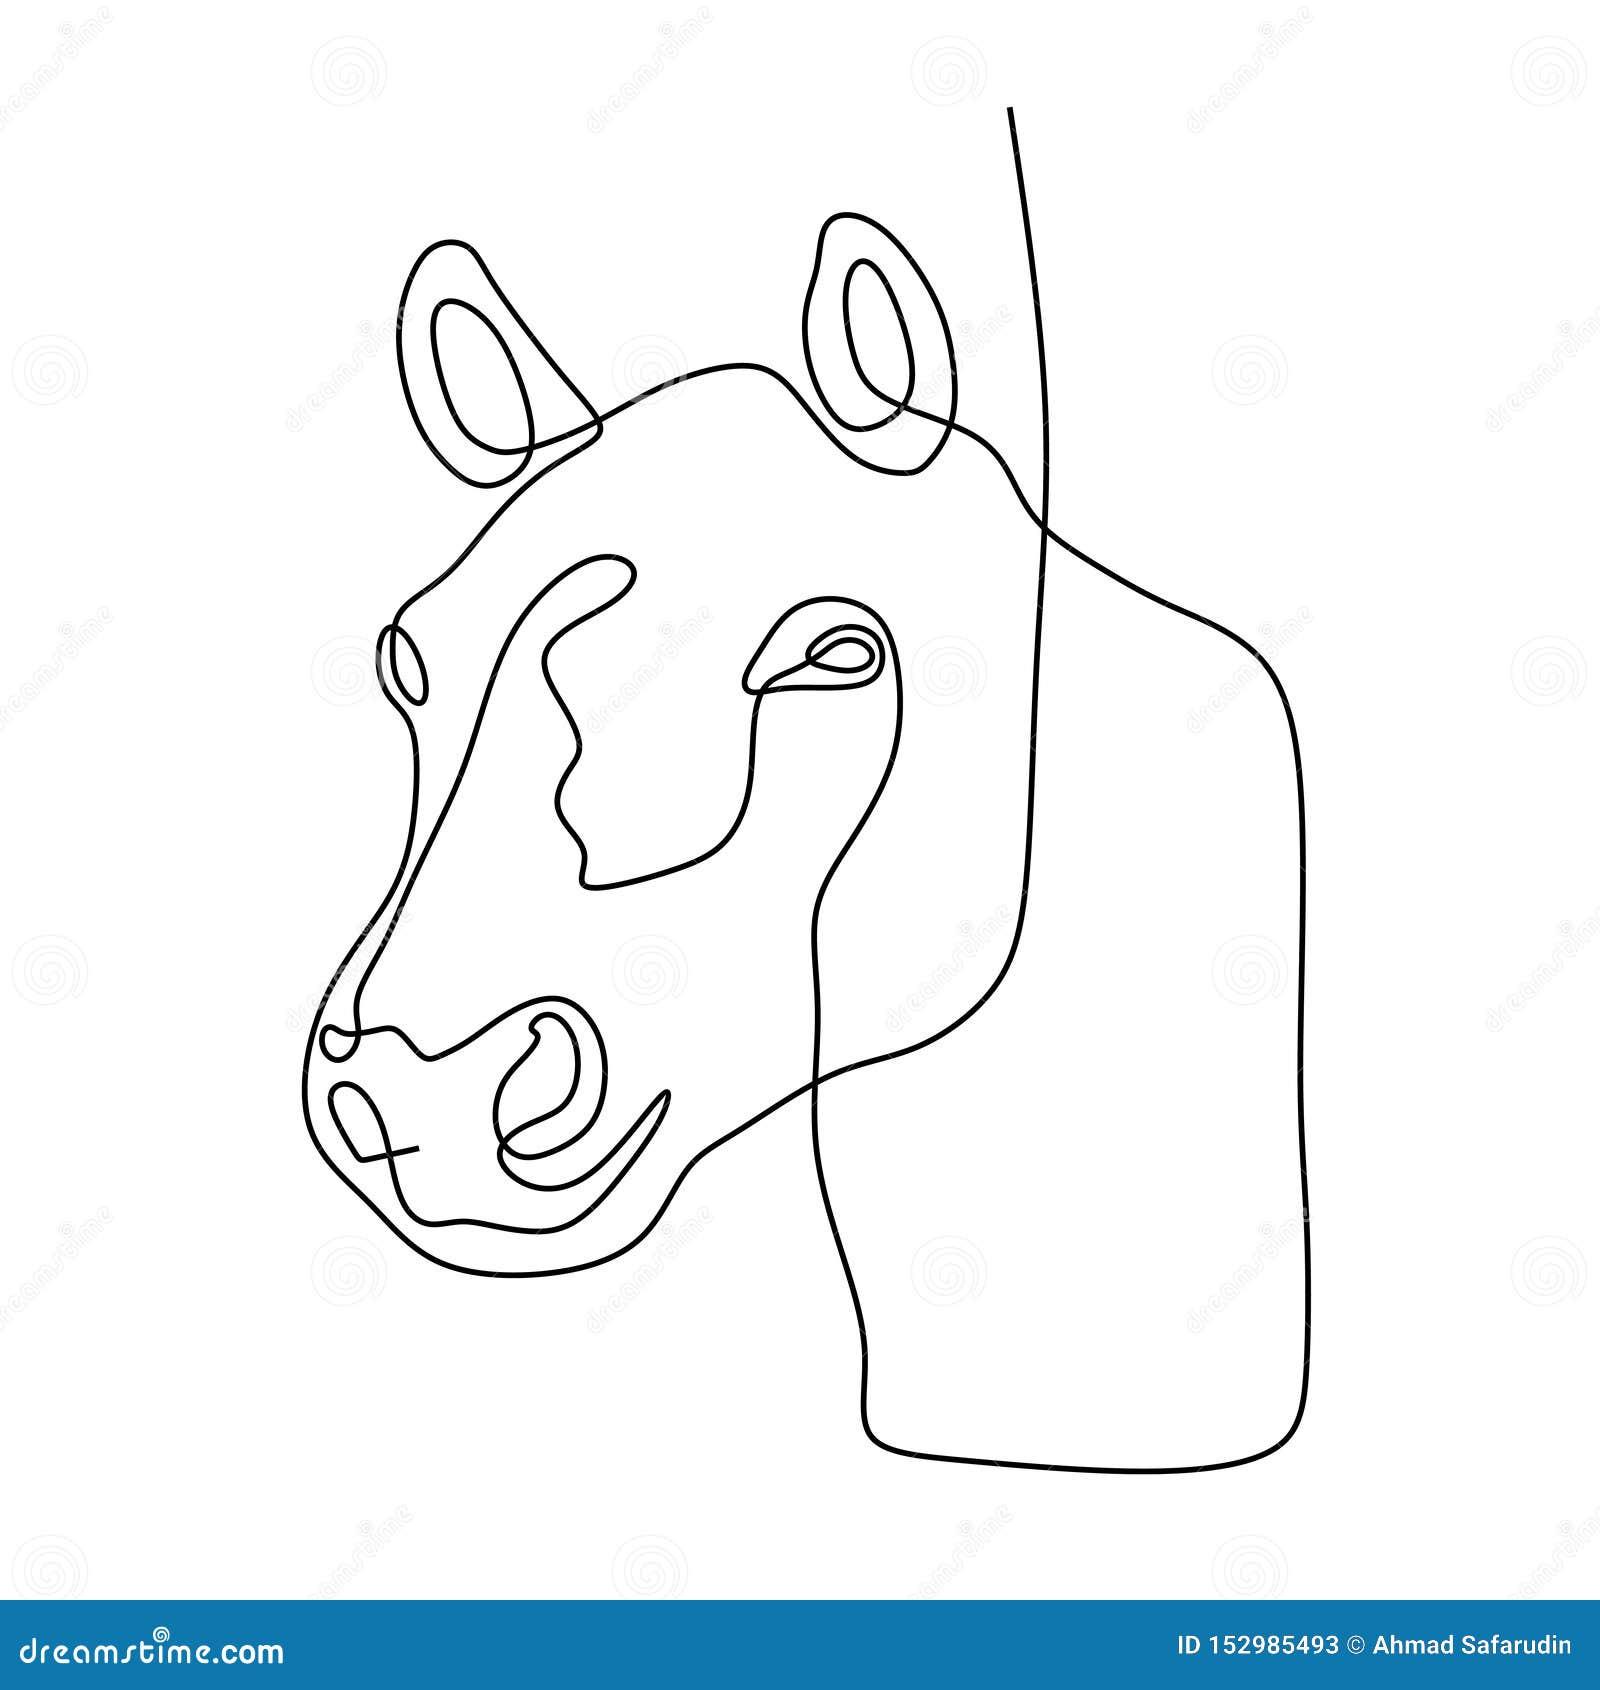 Continuous One Line Horse Head Minimalist Design Vector Illustration Minimalism Style Stock Vector Illustration Of Tattoo Happy 152985493